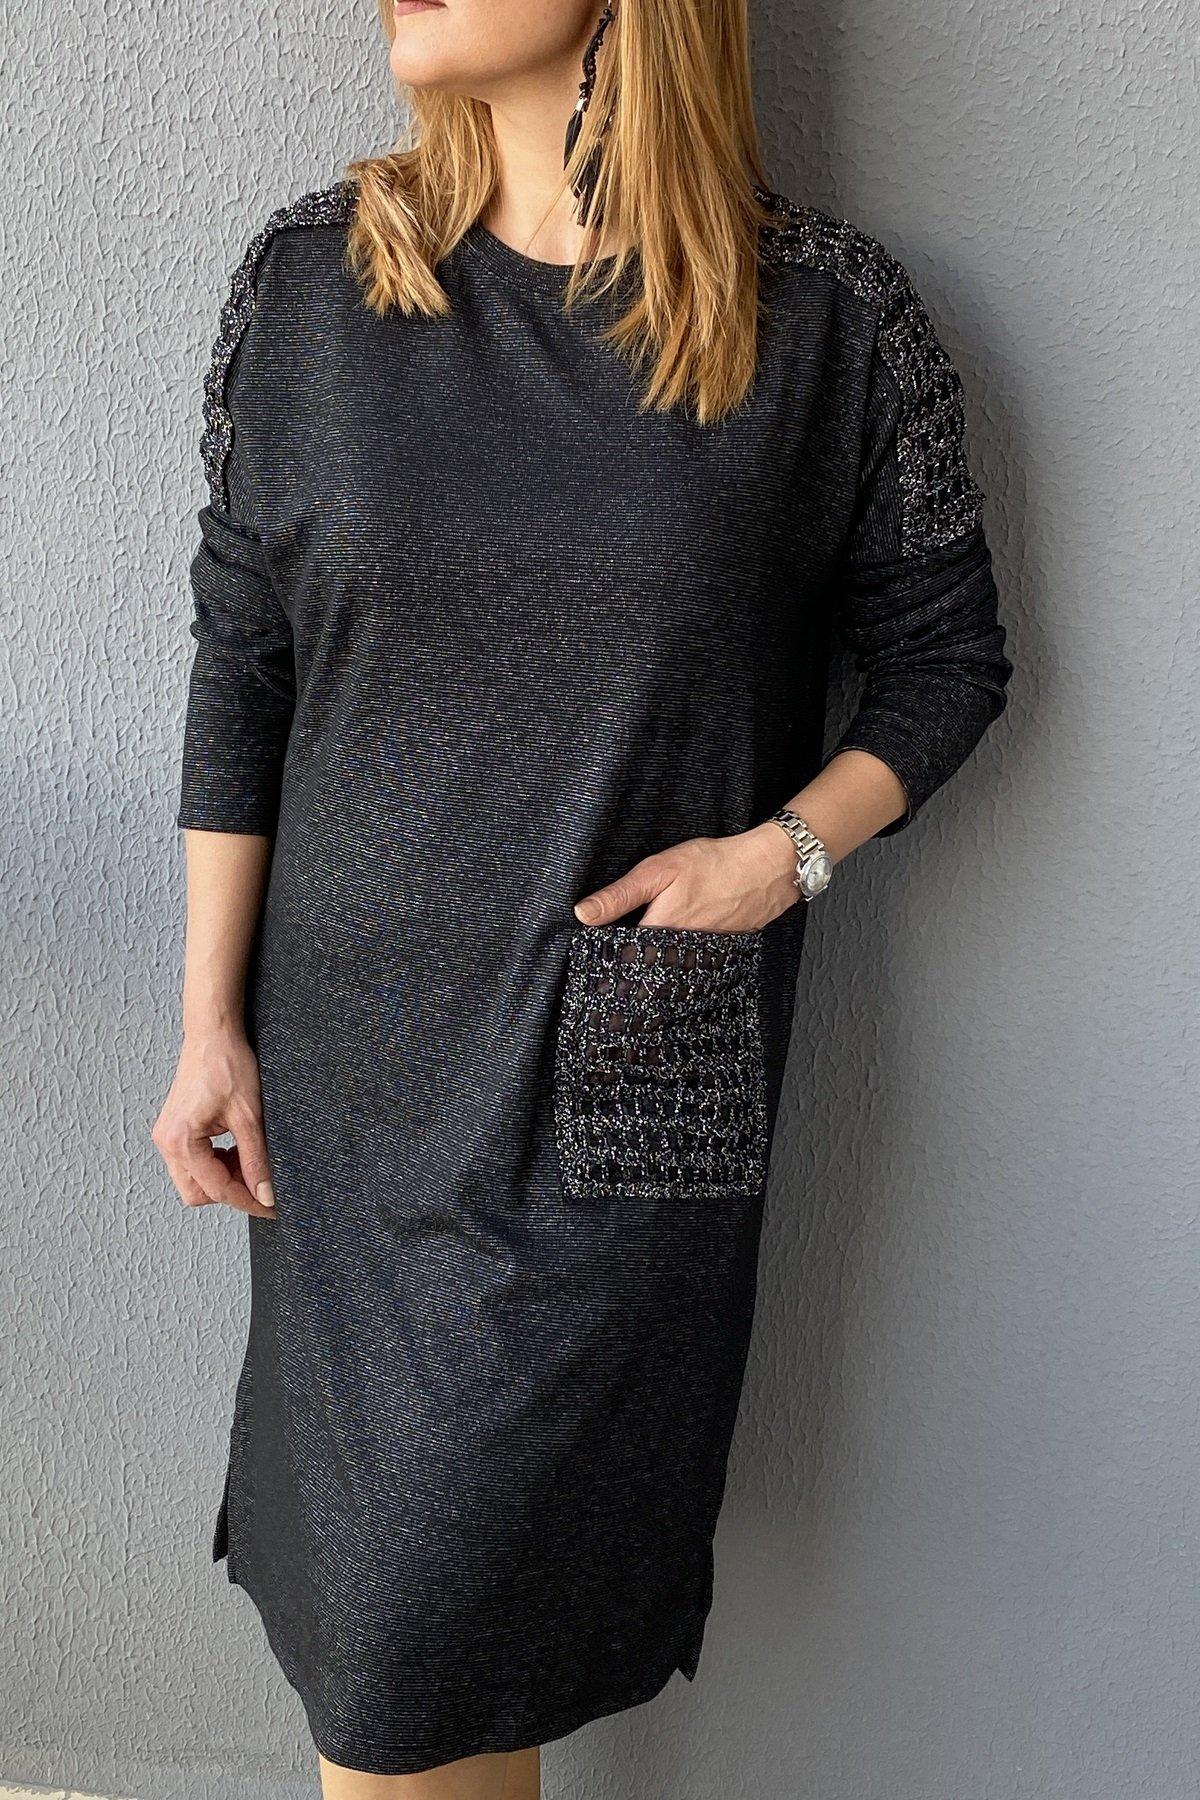 https://resim.chicbag.com.tr/p000038/syh/omuz-ve-cep-kafes-detayli-simli-elbise-01ab104f8a8c.